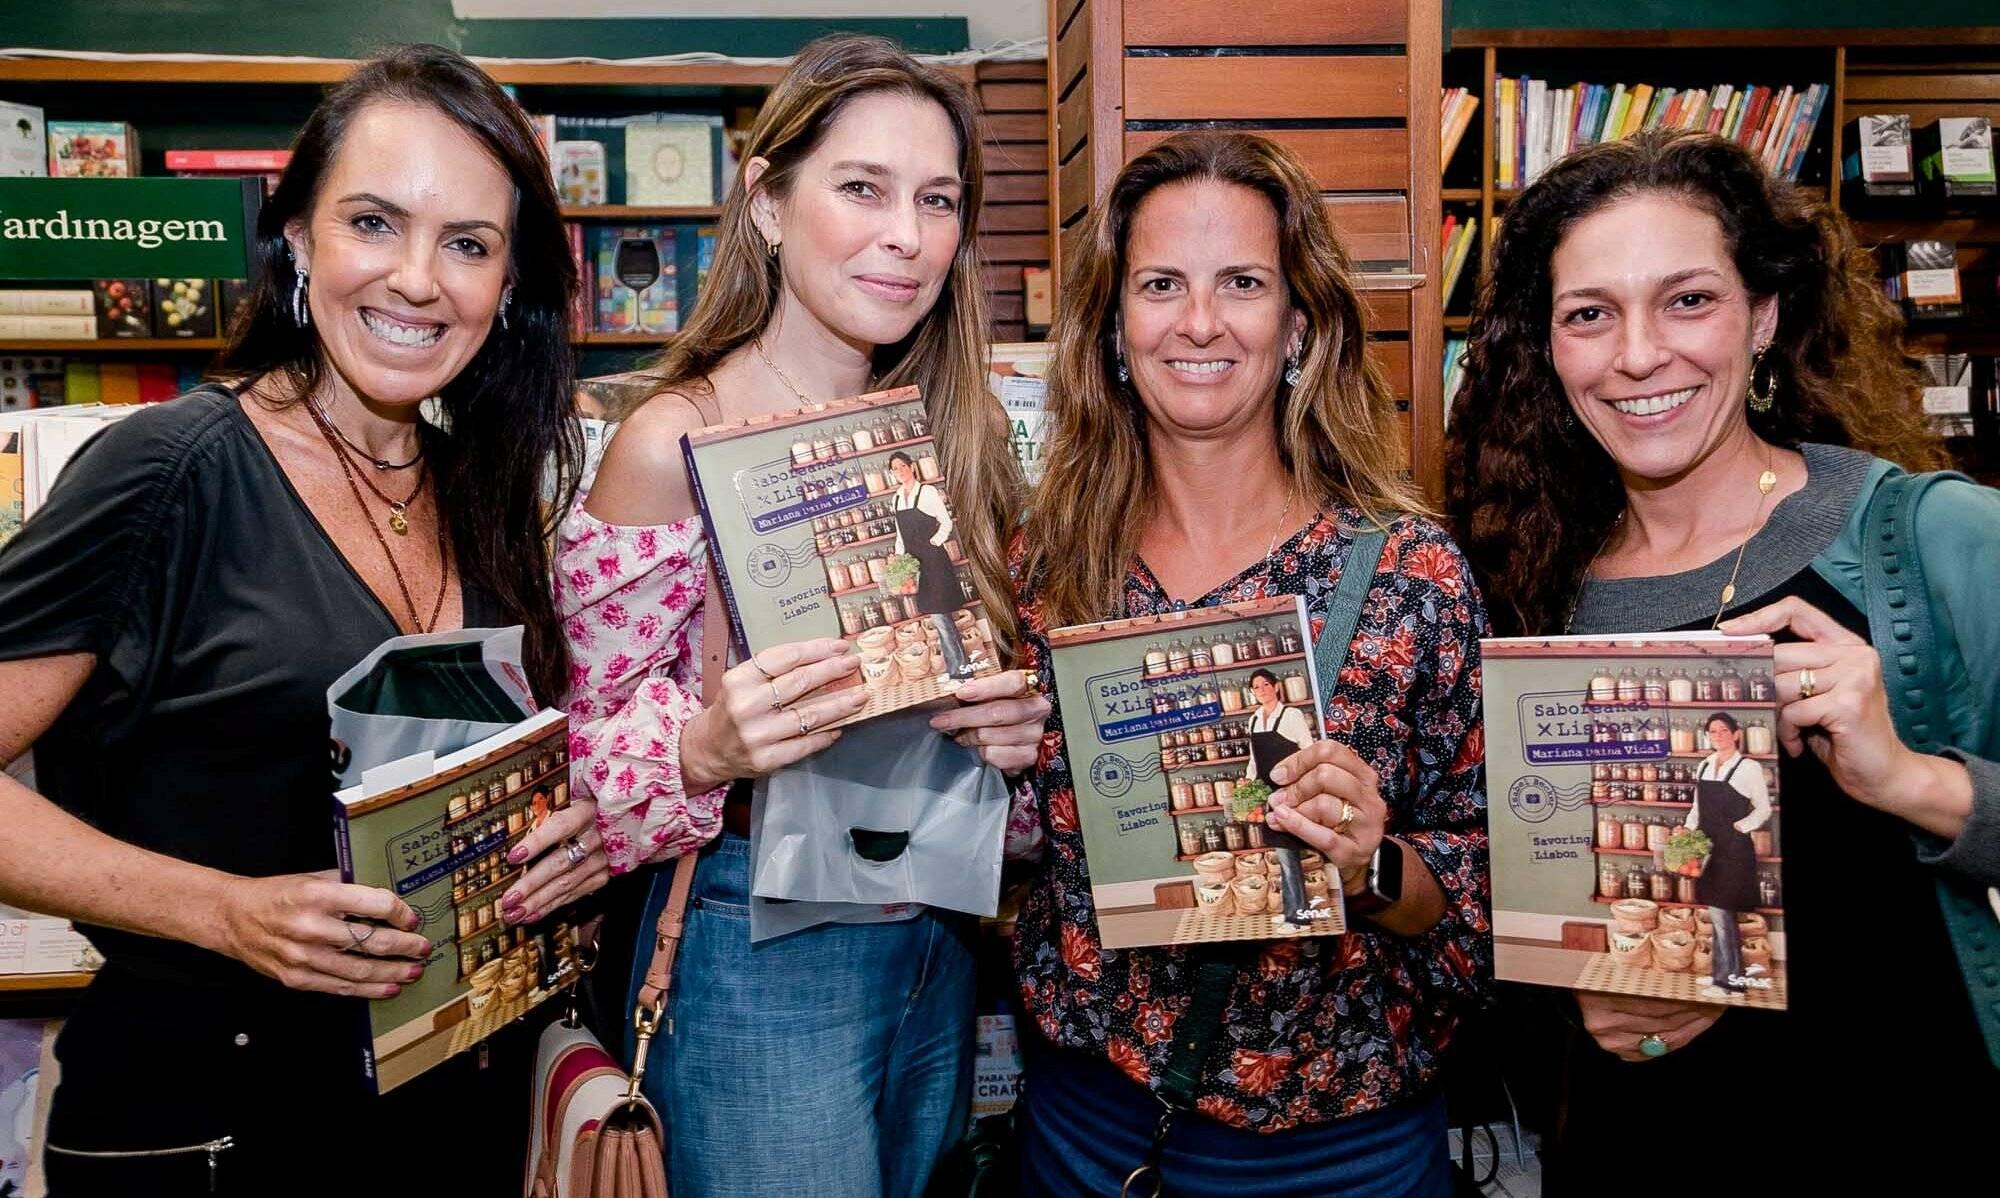 Ana Cecilia Barreto, Teresa Hermanny, Tita Flexa Ribeiro e Bruna Sorrentino Barreto / Foto: Miguel Sá